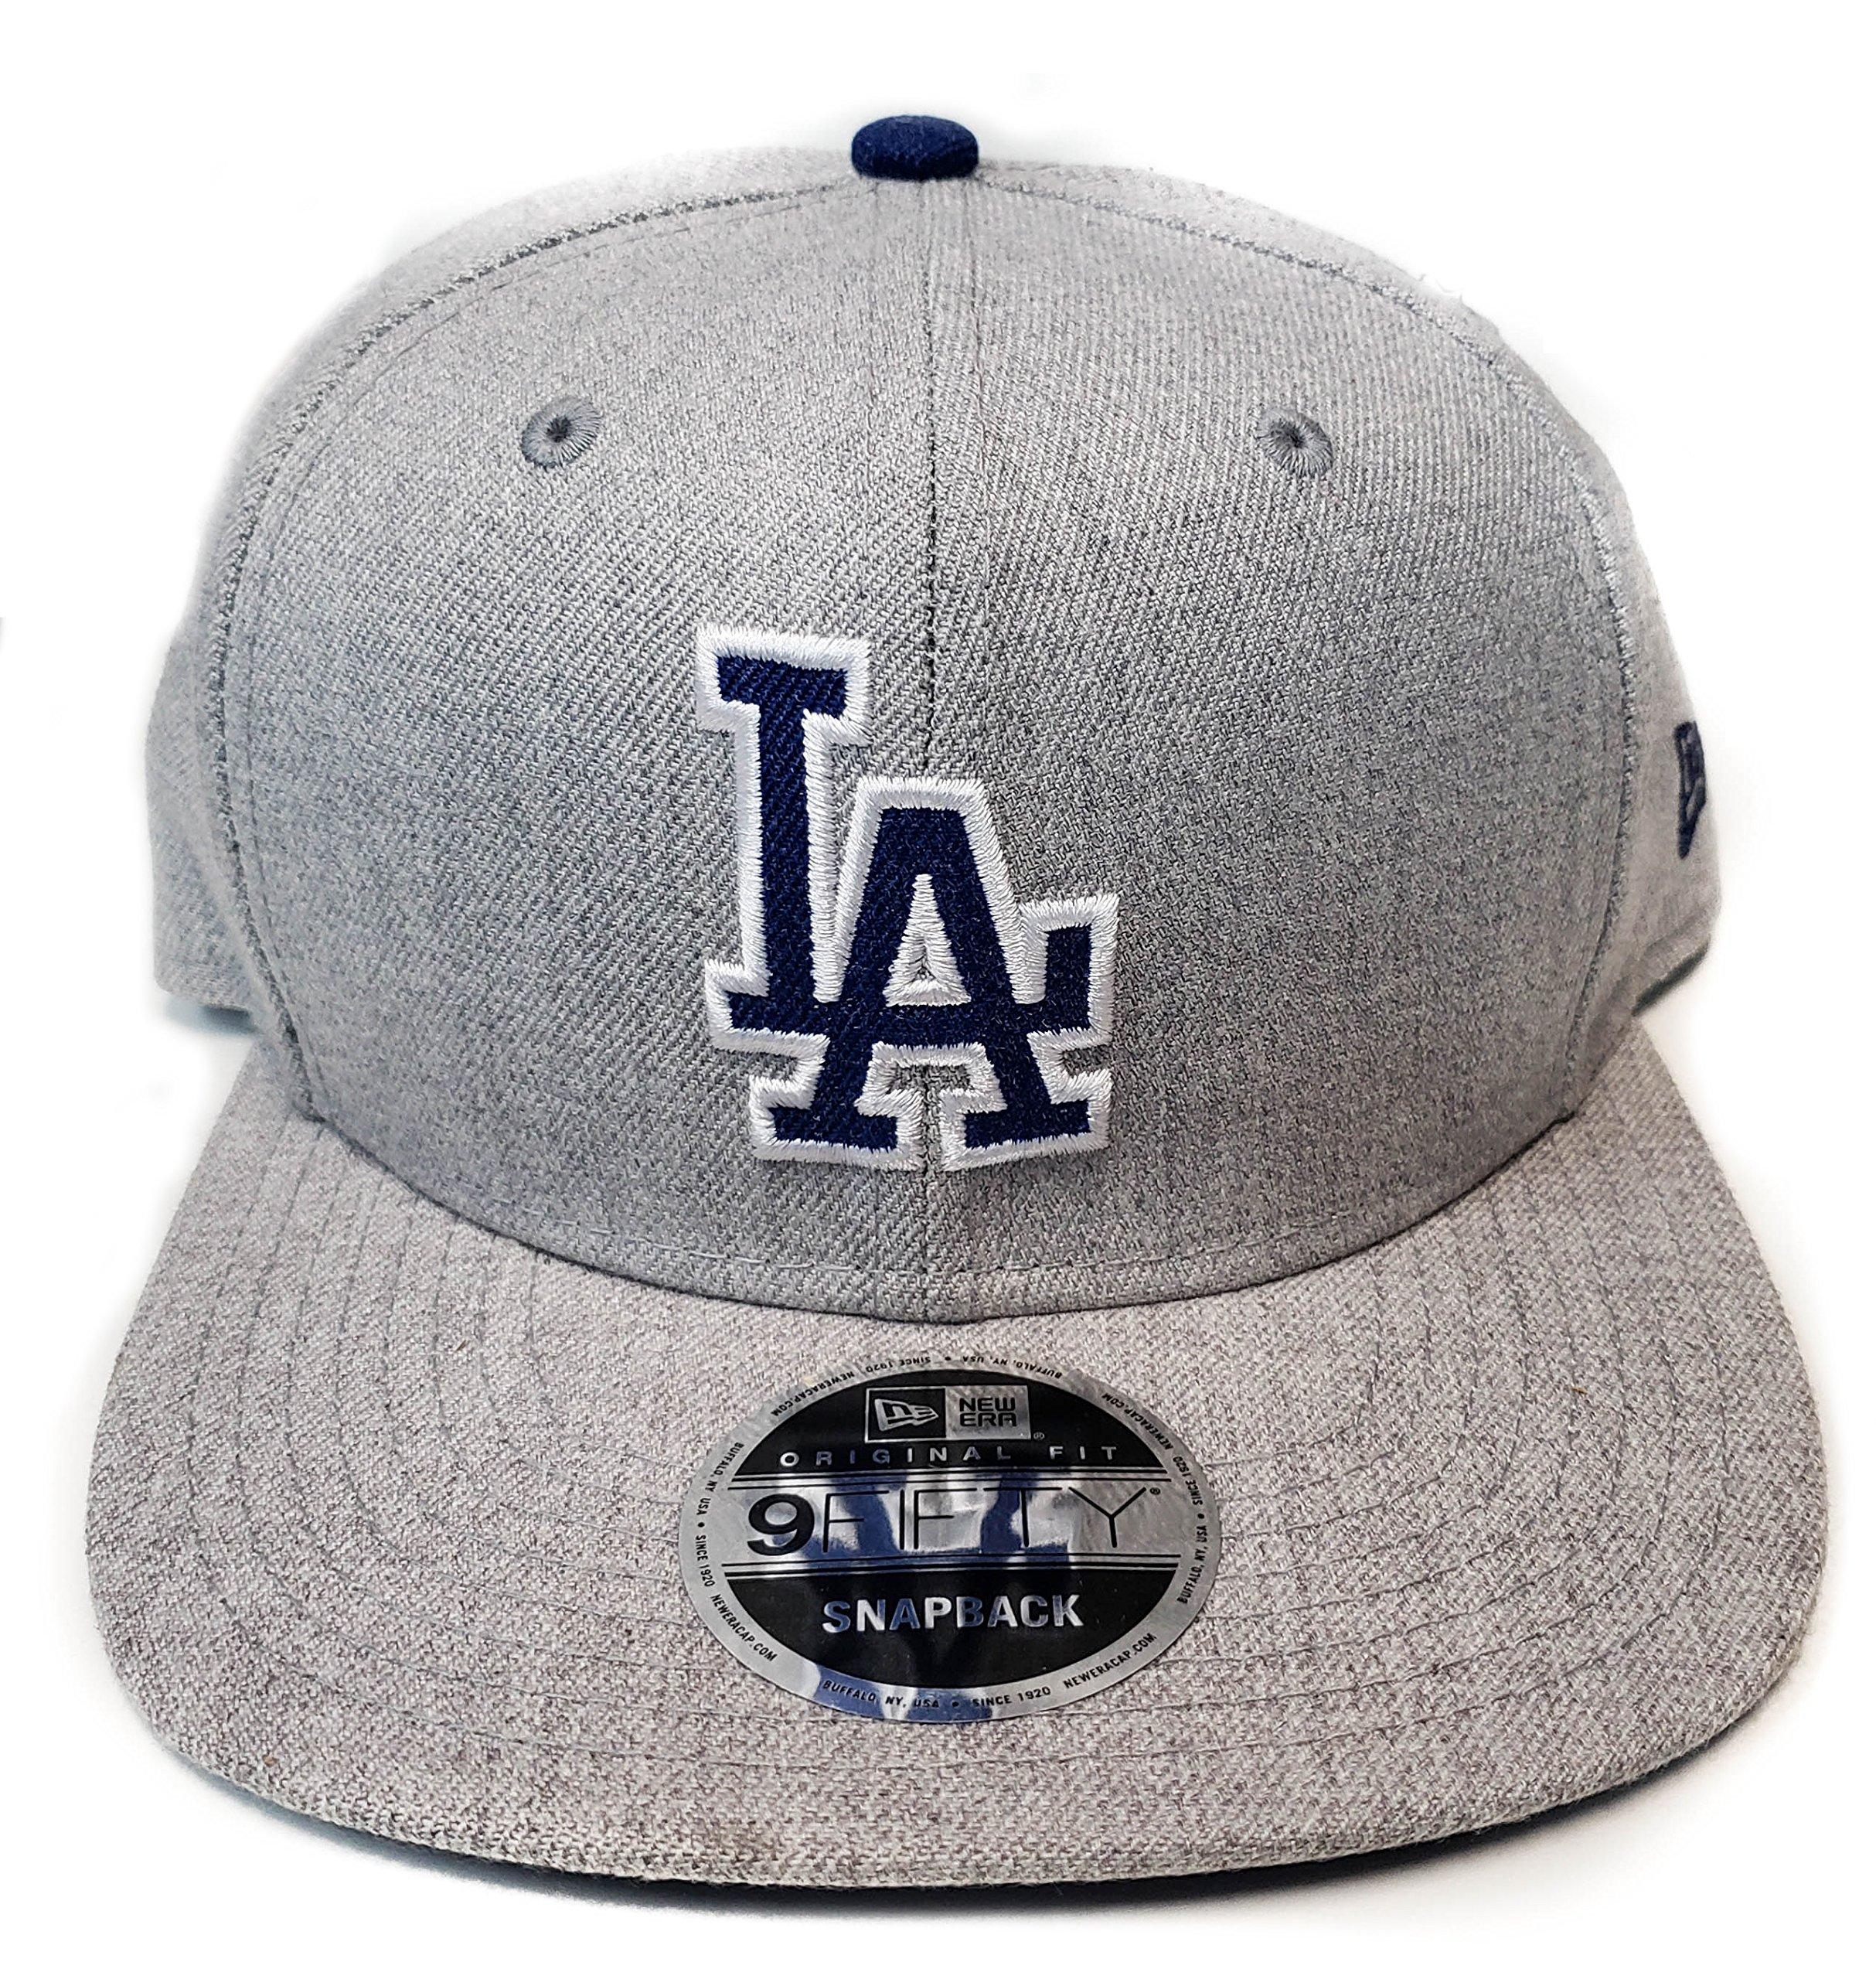 0558b014 New Era Og Fits Los Angeles Dodgers Grey Blue Heather Snapback Hat ...